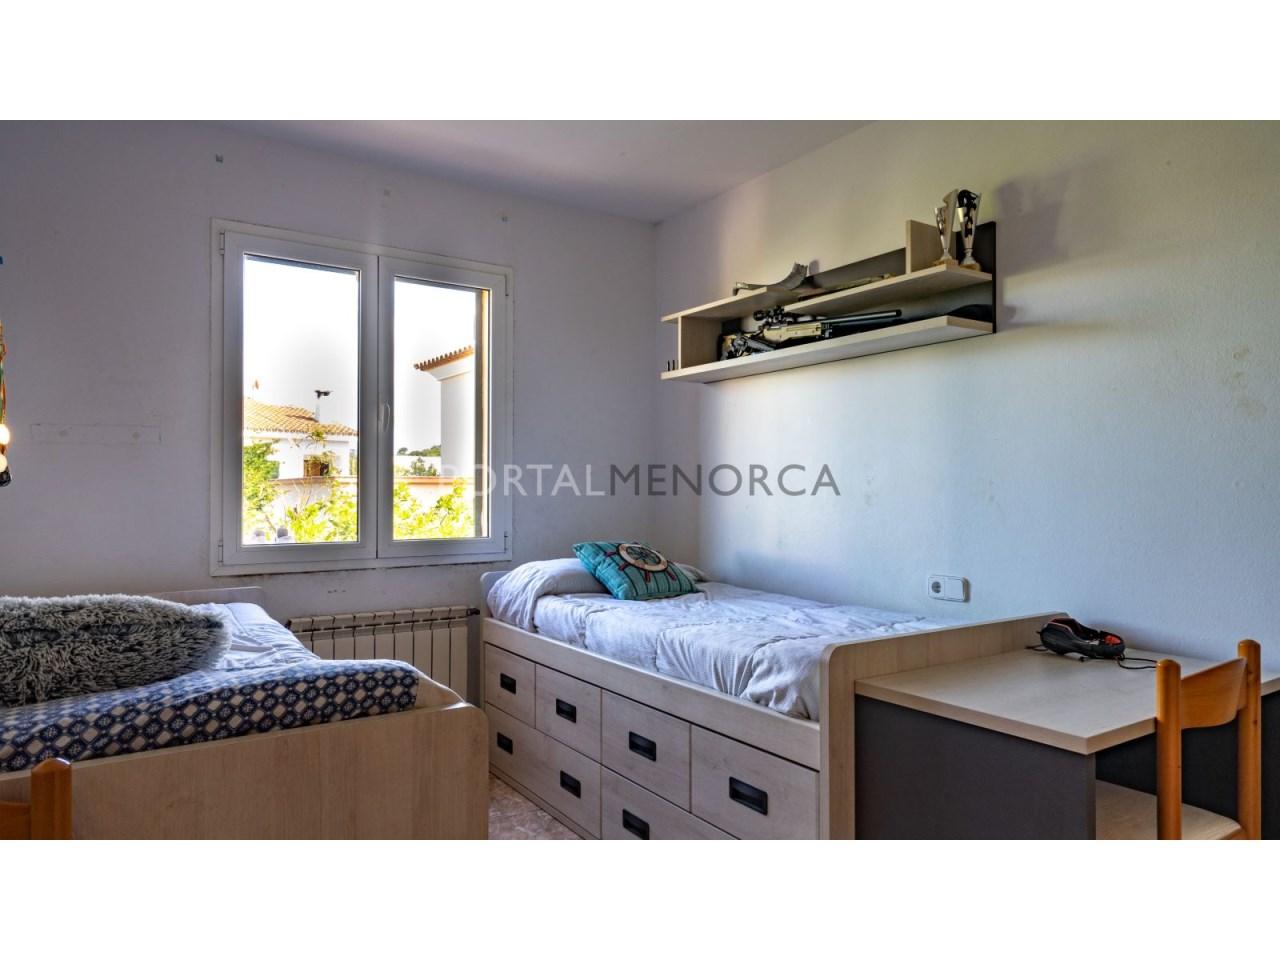 venta-casa-alaior-menorca-inmobiliaria (1)